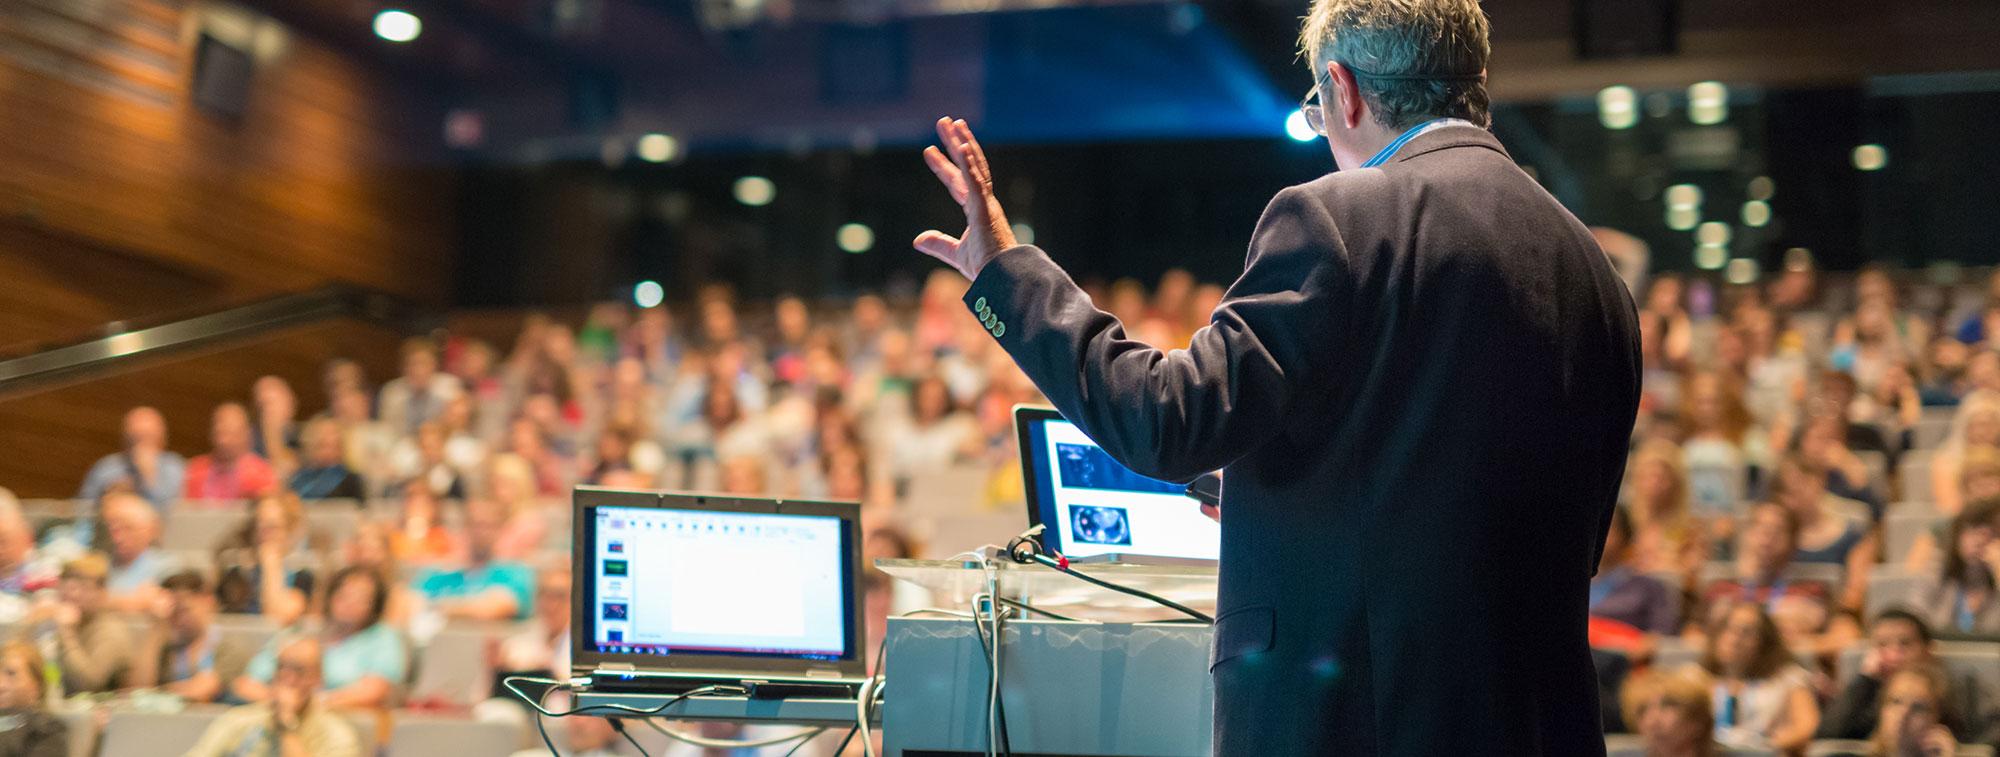 Audience-Response-Company.jpg